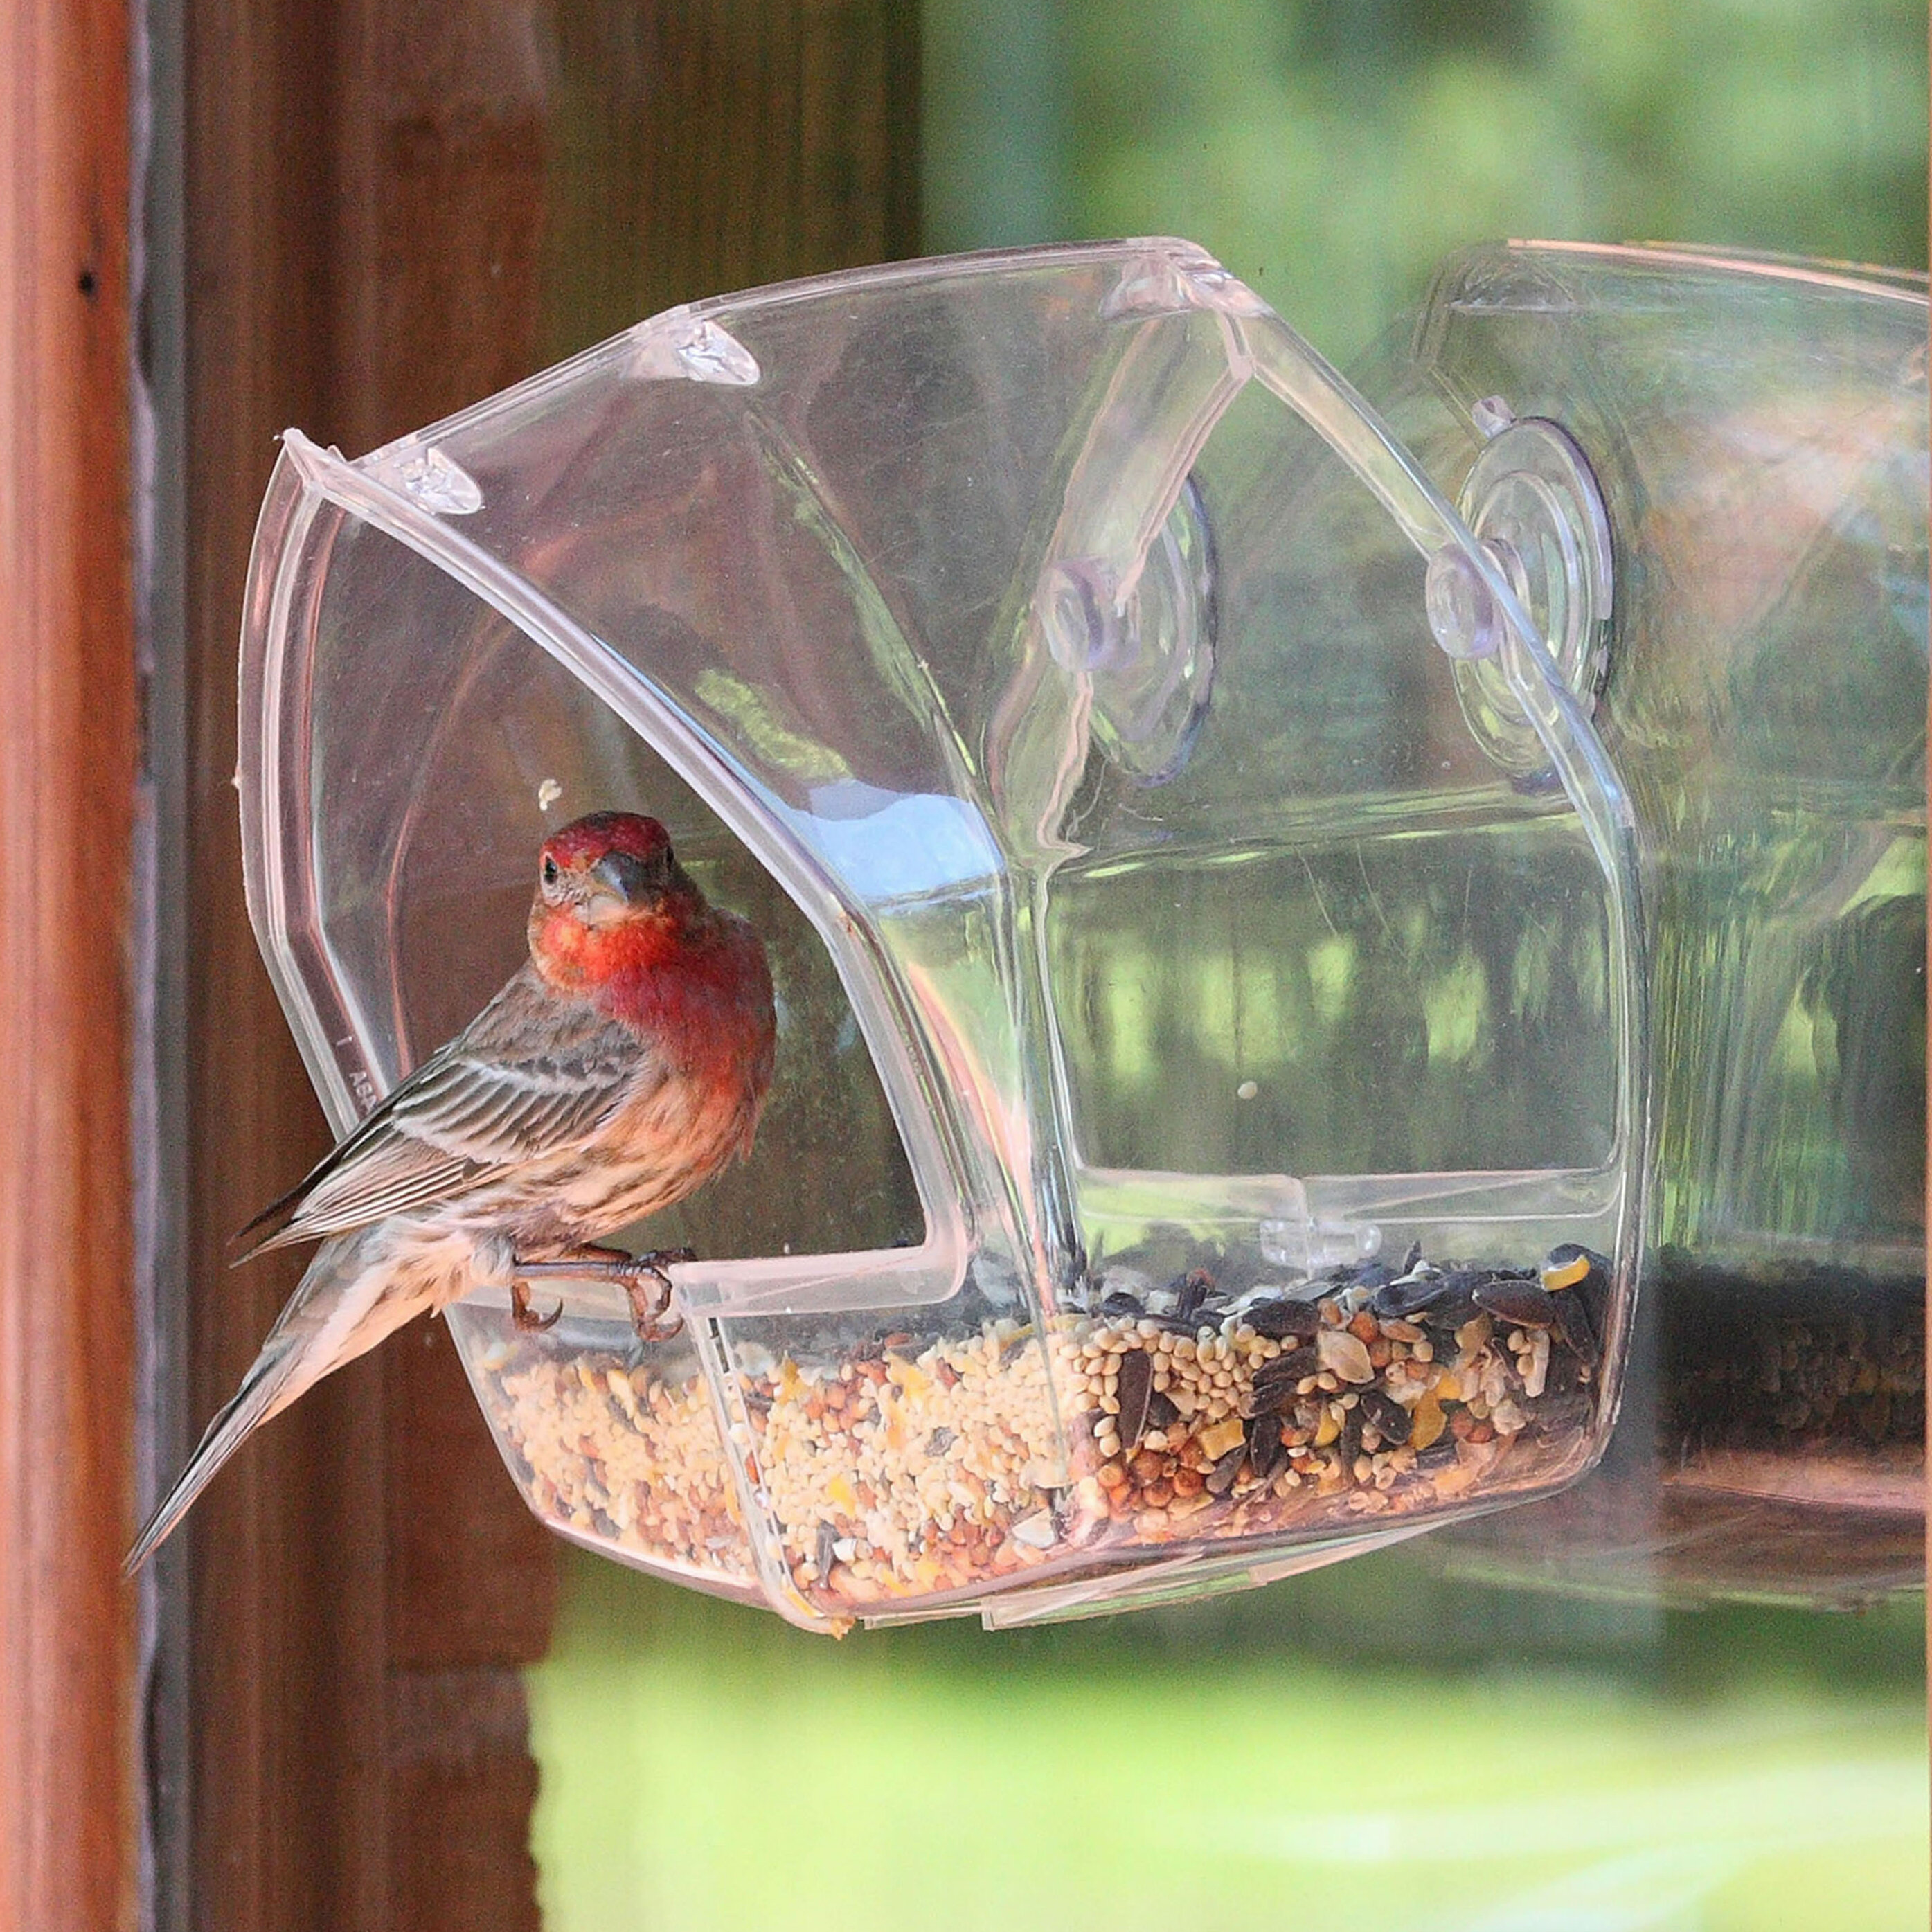 Clear Window Bird Feeder Birdhouse For Viewing Wild Birds From Inside 8C